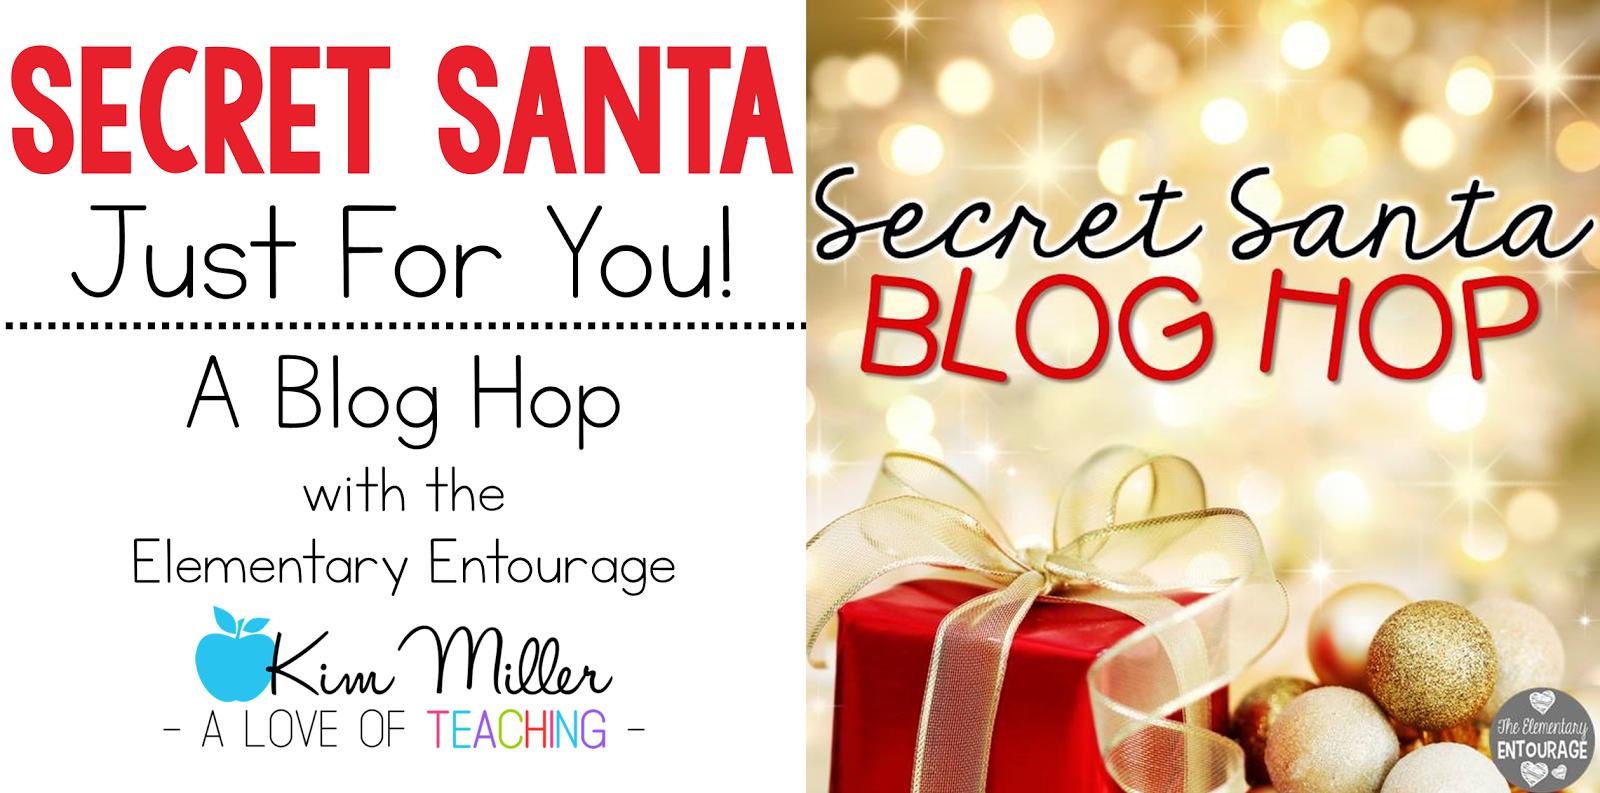 A Secret Santa Blog Hop with The Elementary Entourage